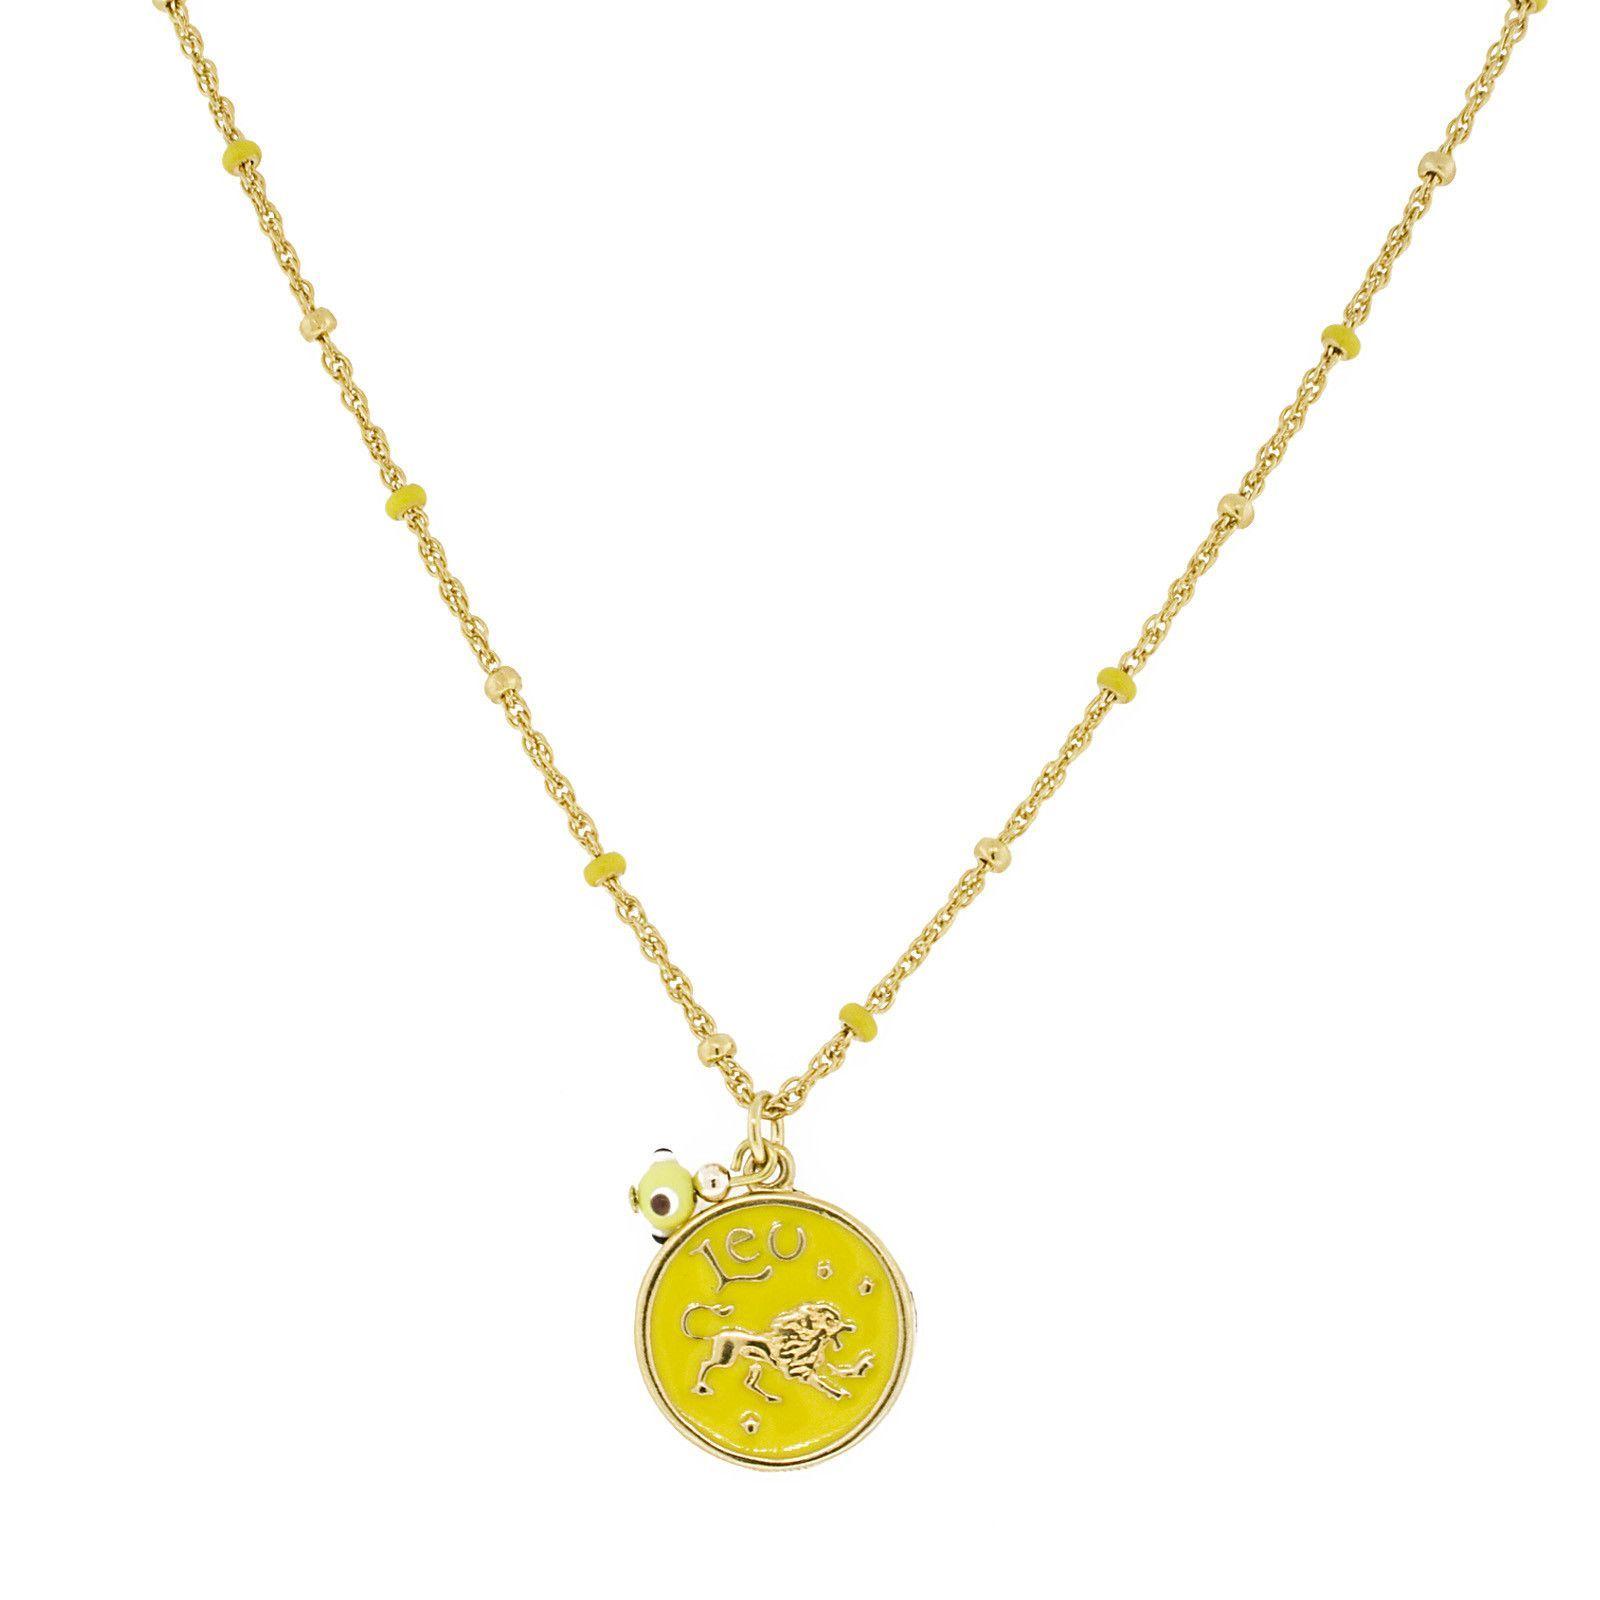 Blee Inara Enamel Horoscope Necklace - Leo